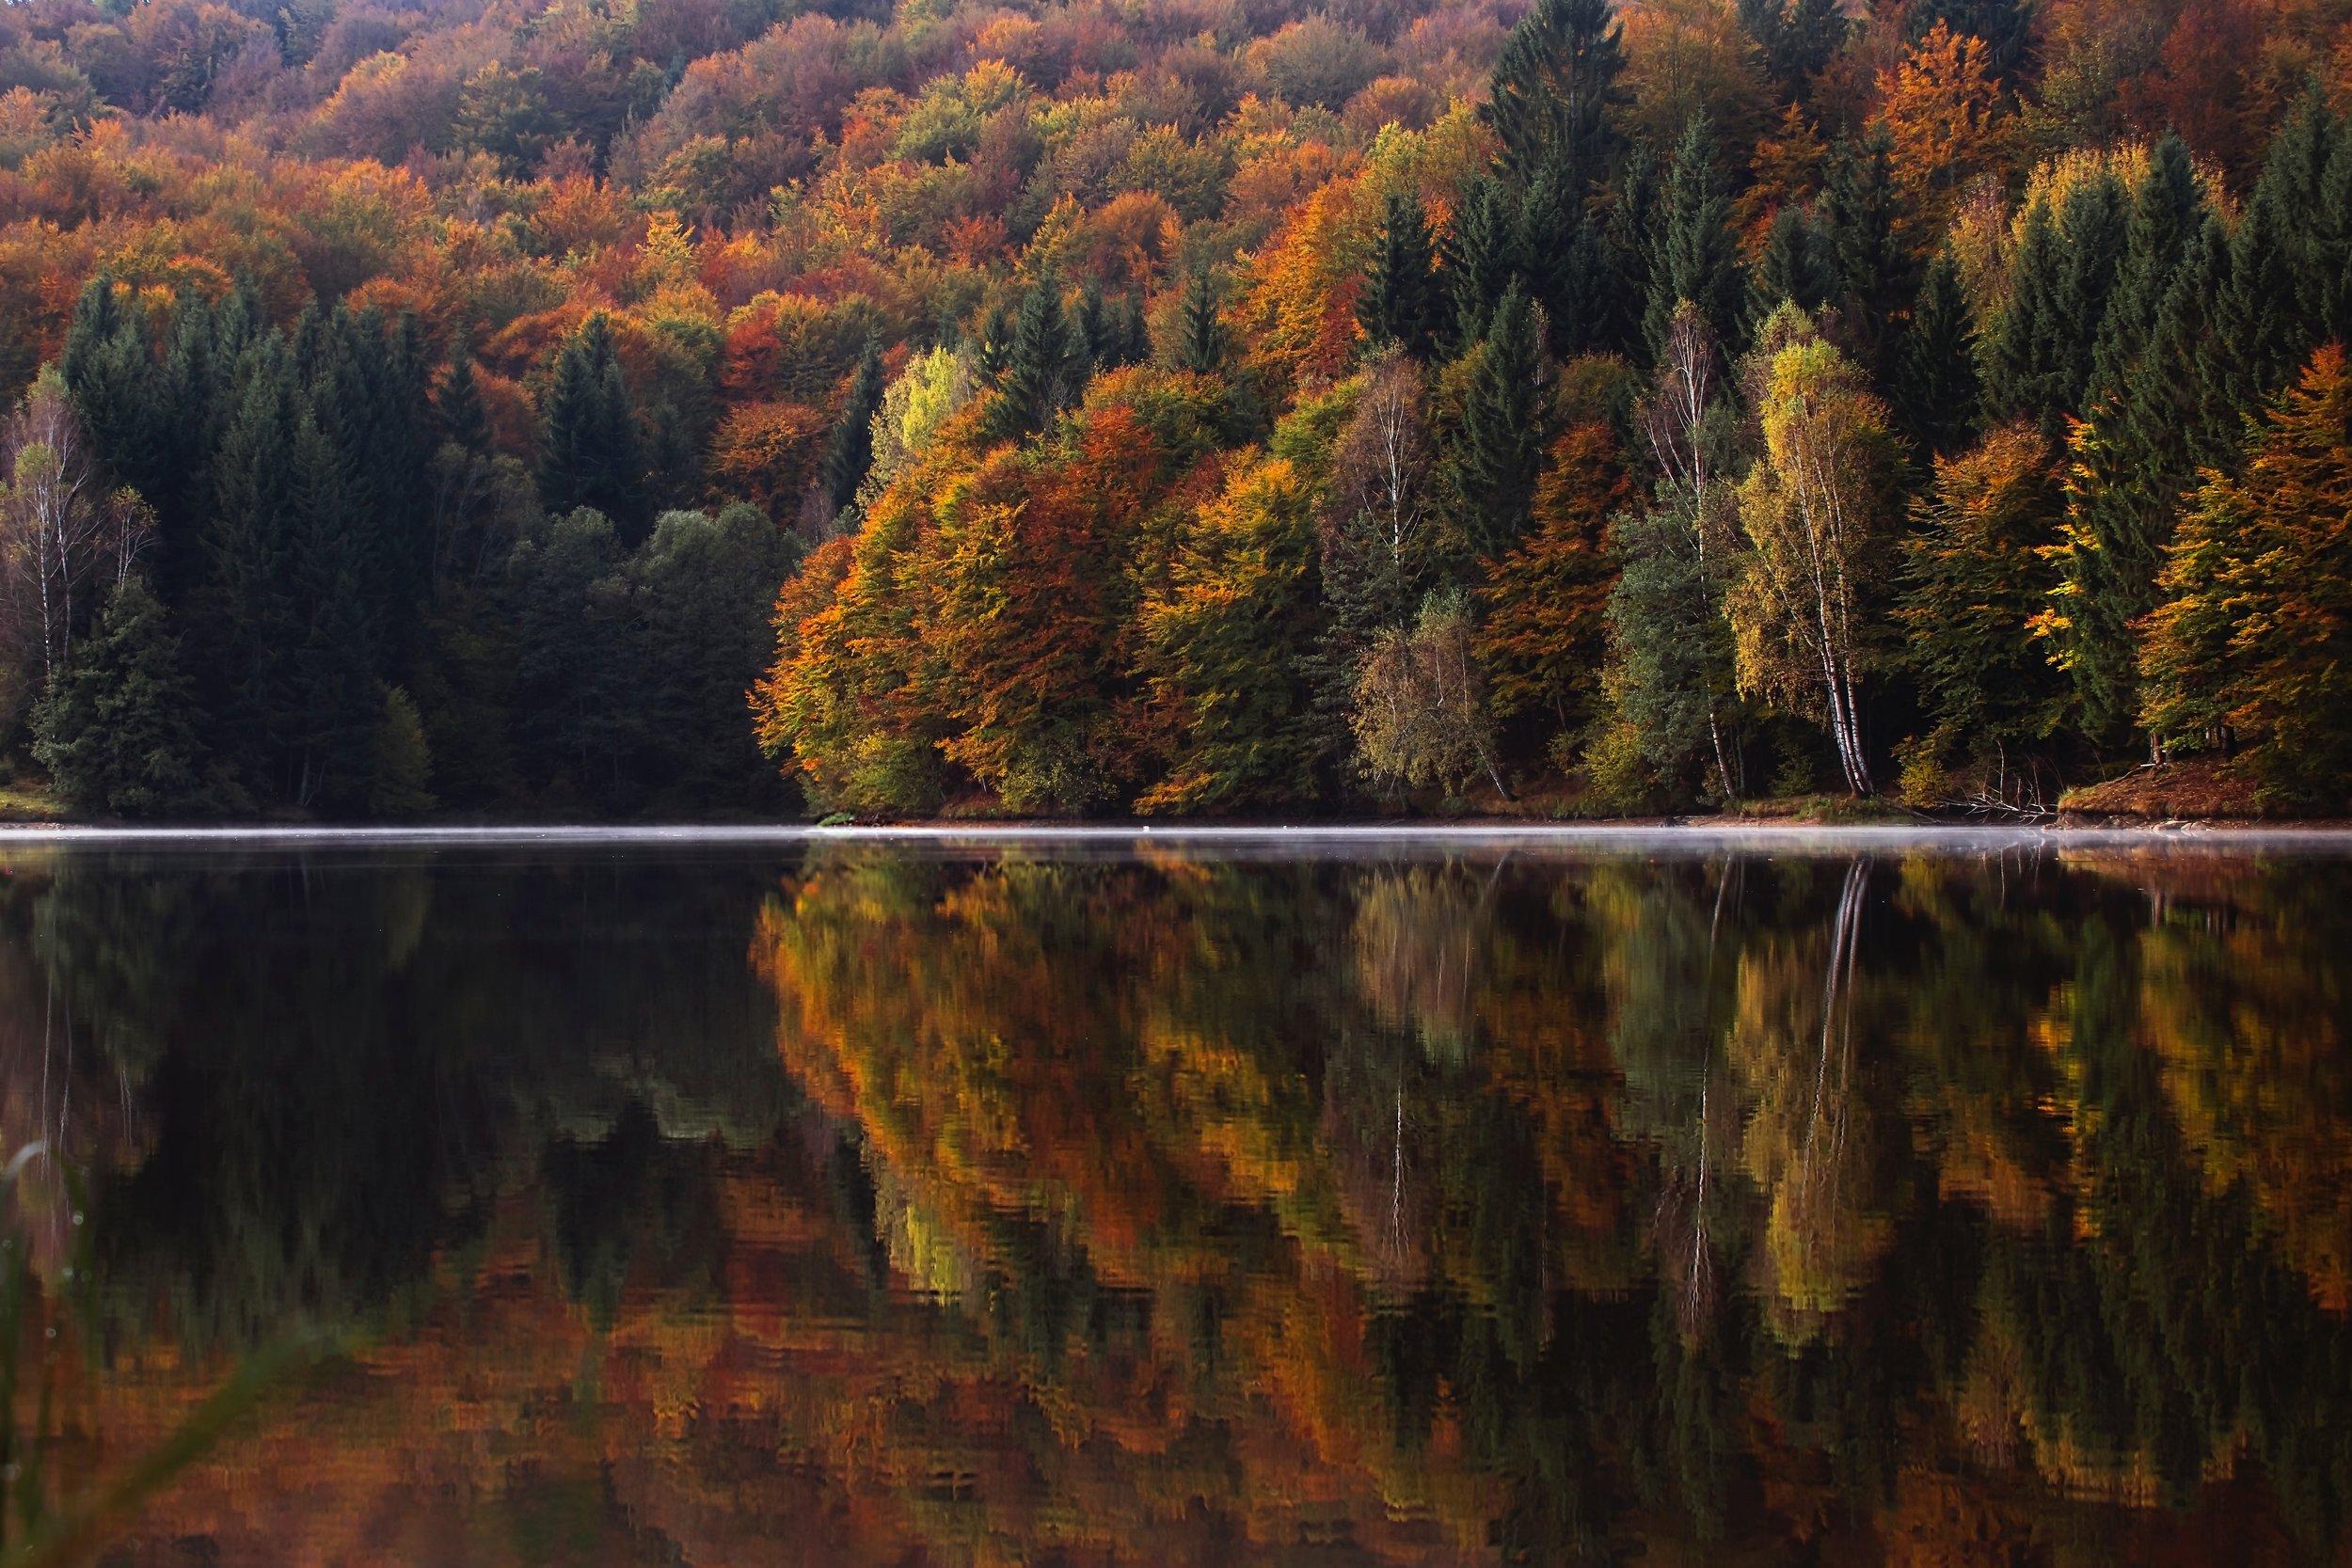 autumnal-colorful-conifer-217120.jpg